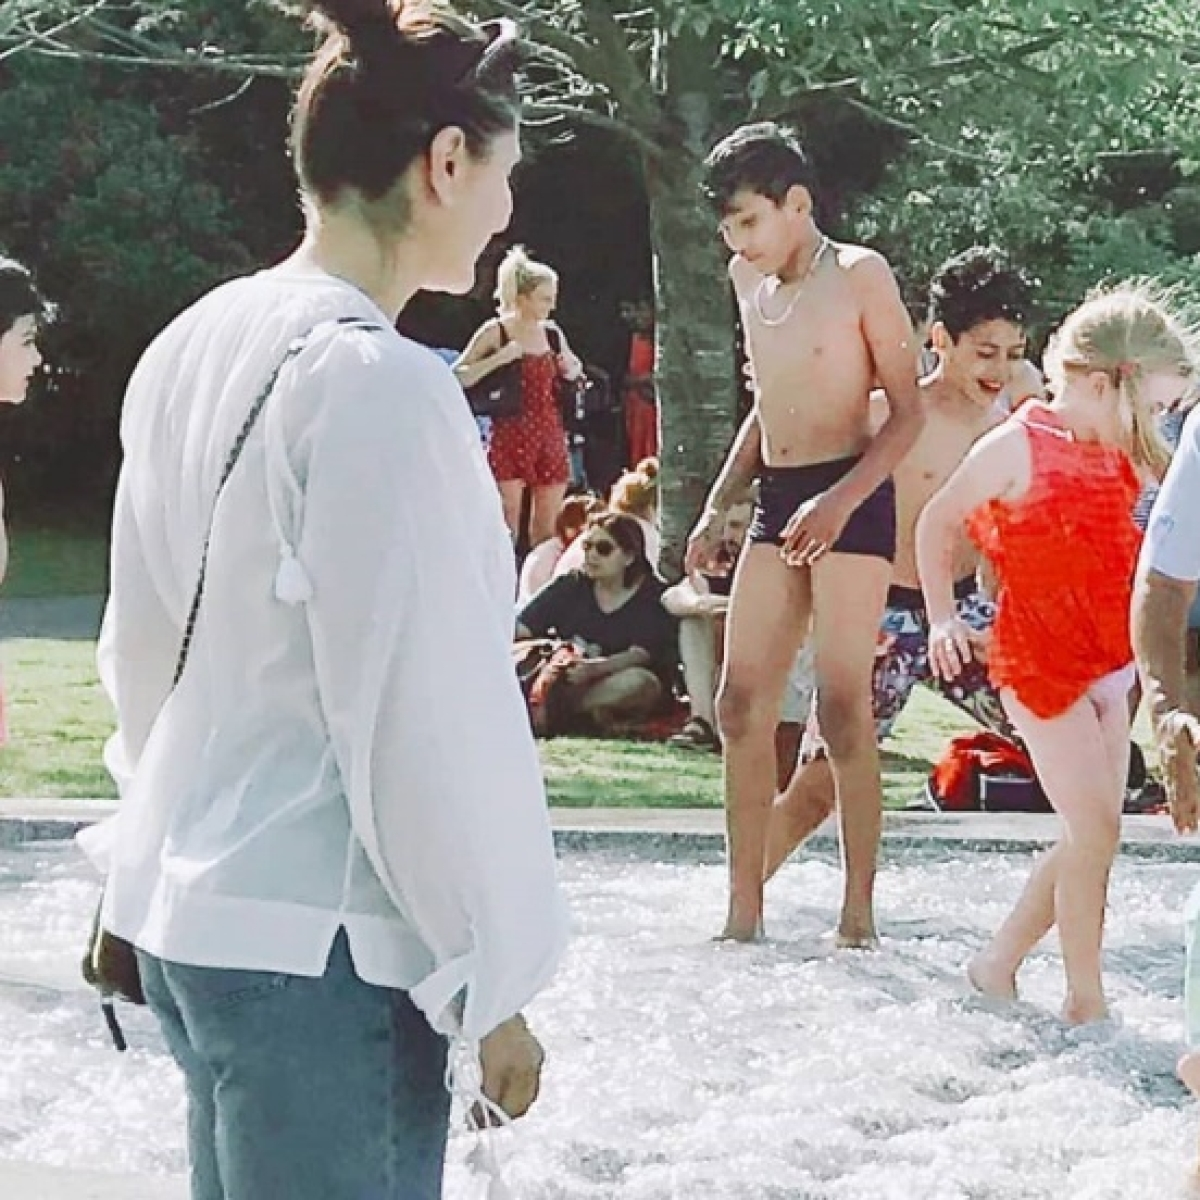 See Pics: Kareena Kapoor enjoys pool-party with son Taimur Ali Khan